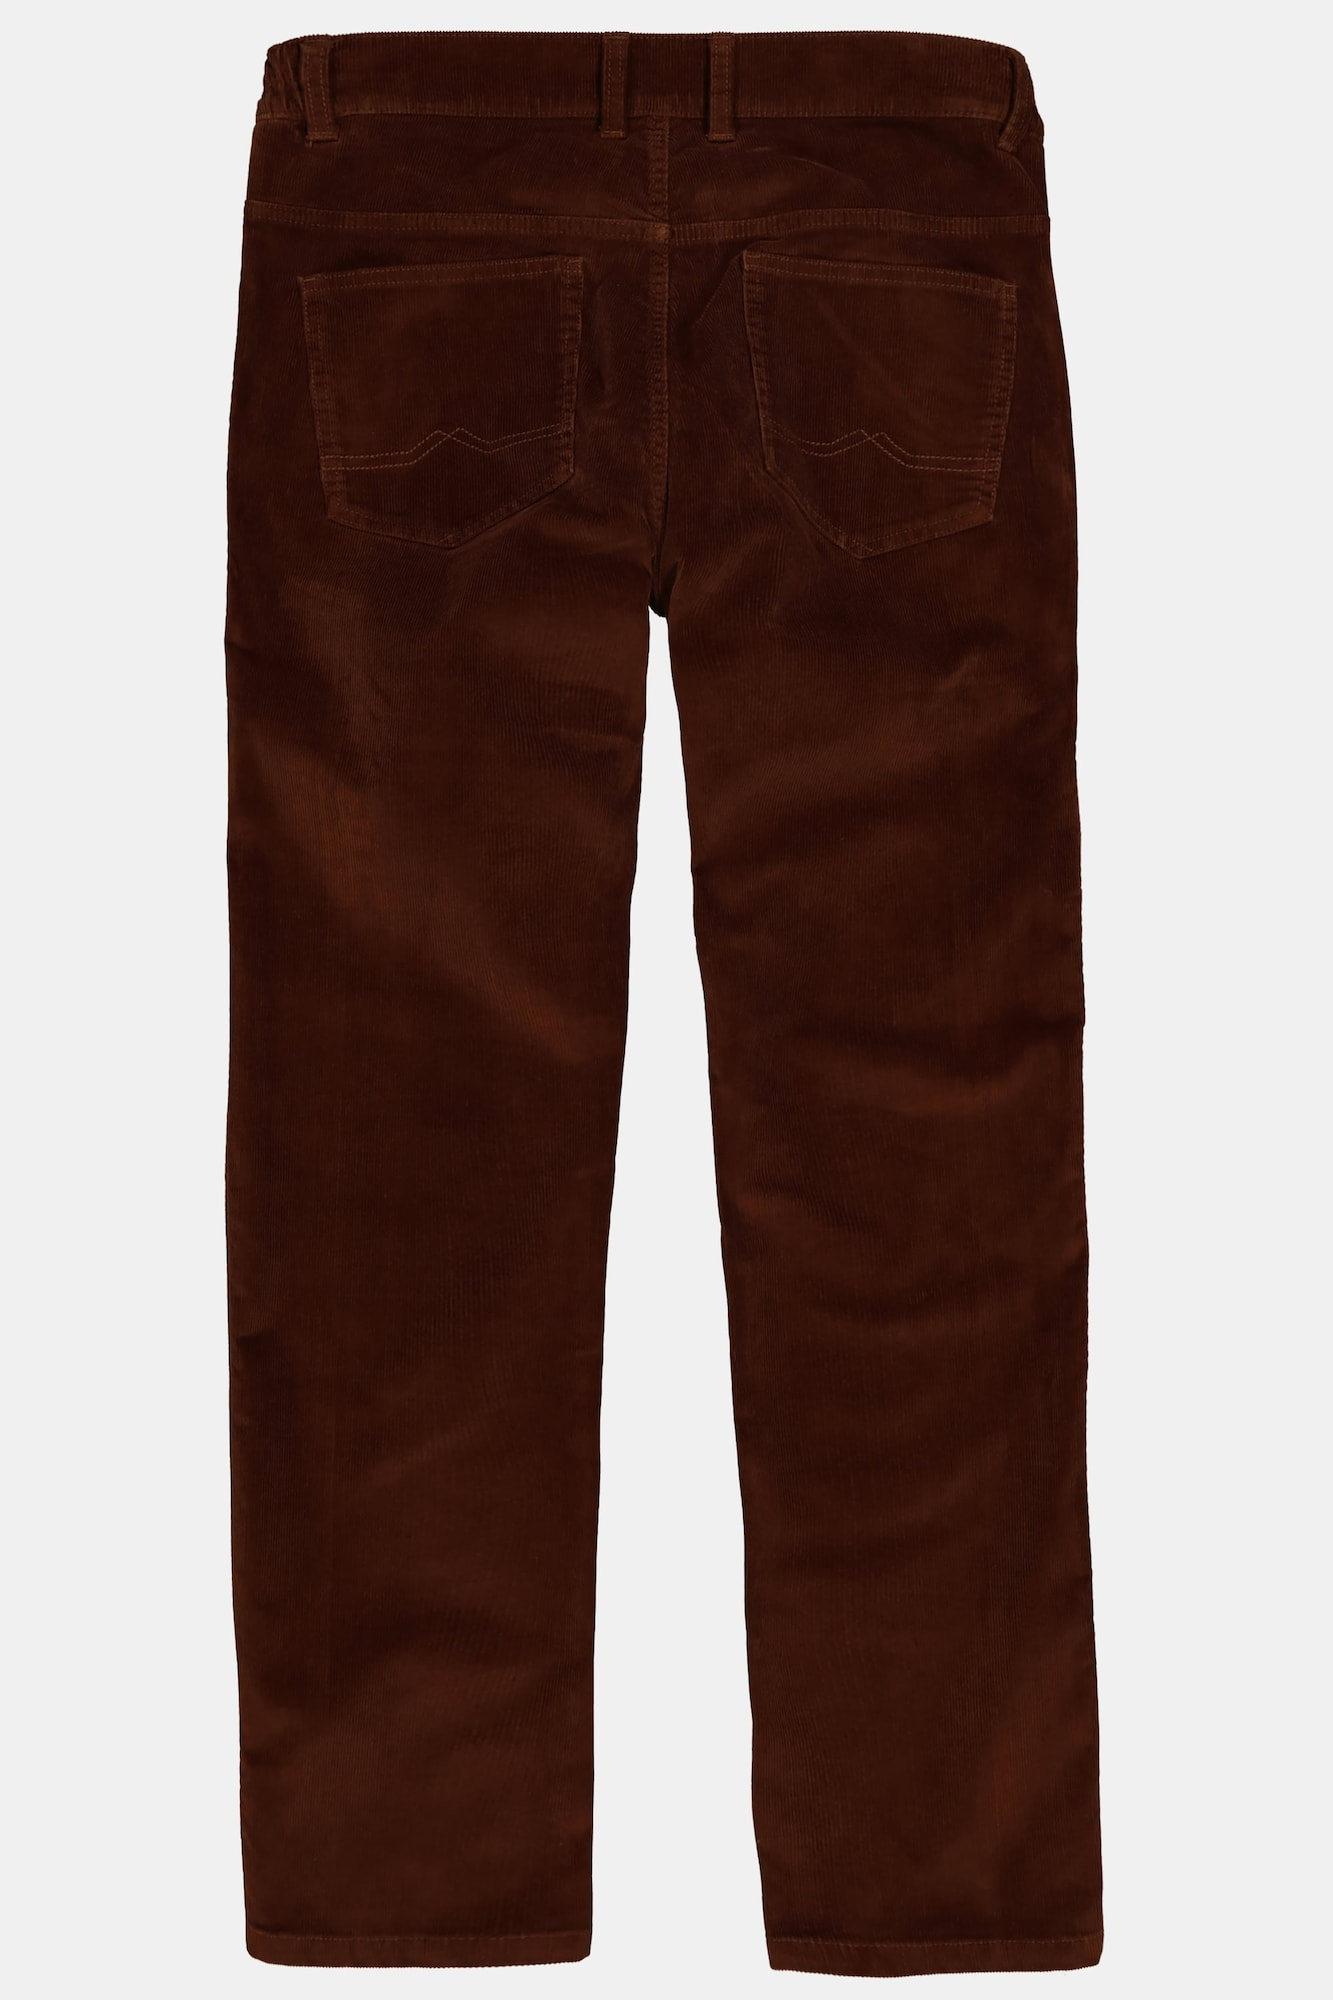 jp1880 - JP 1880 Herren große Größen Cordhose 723471